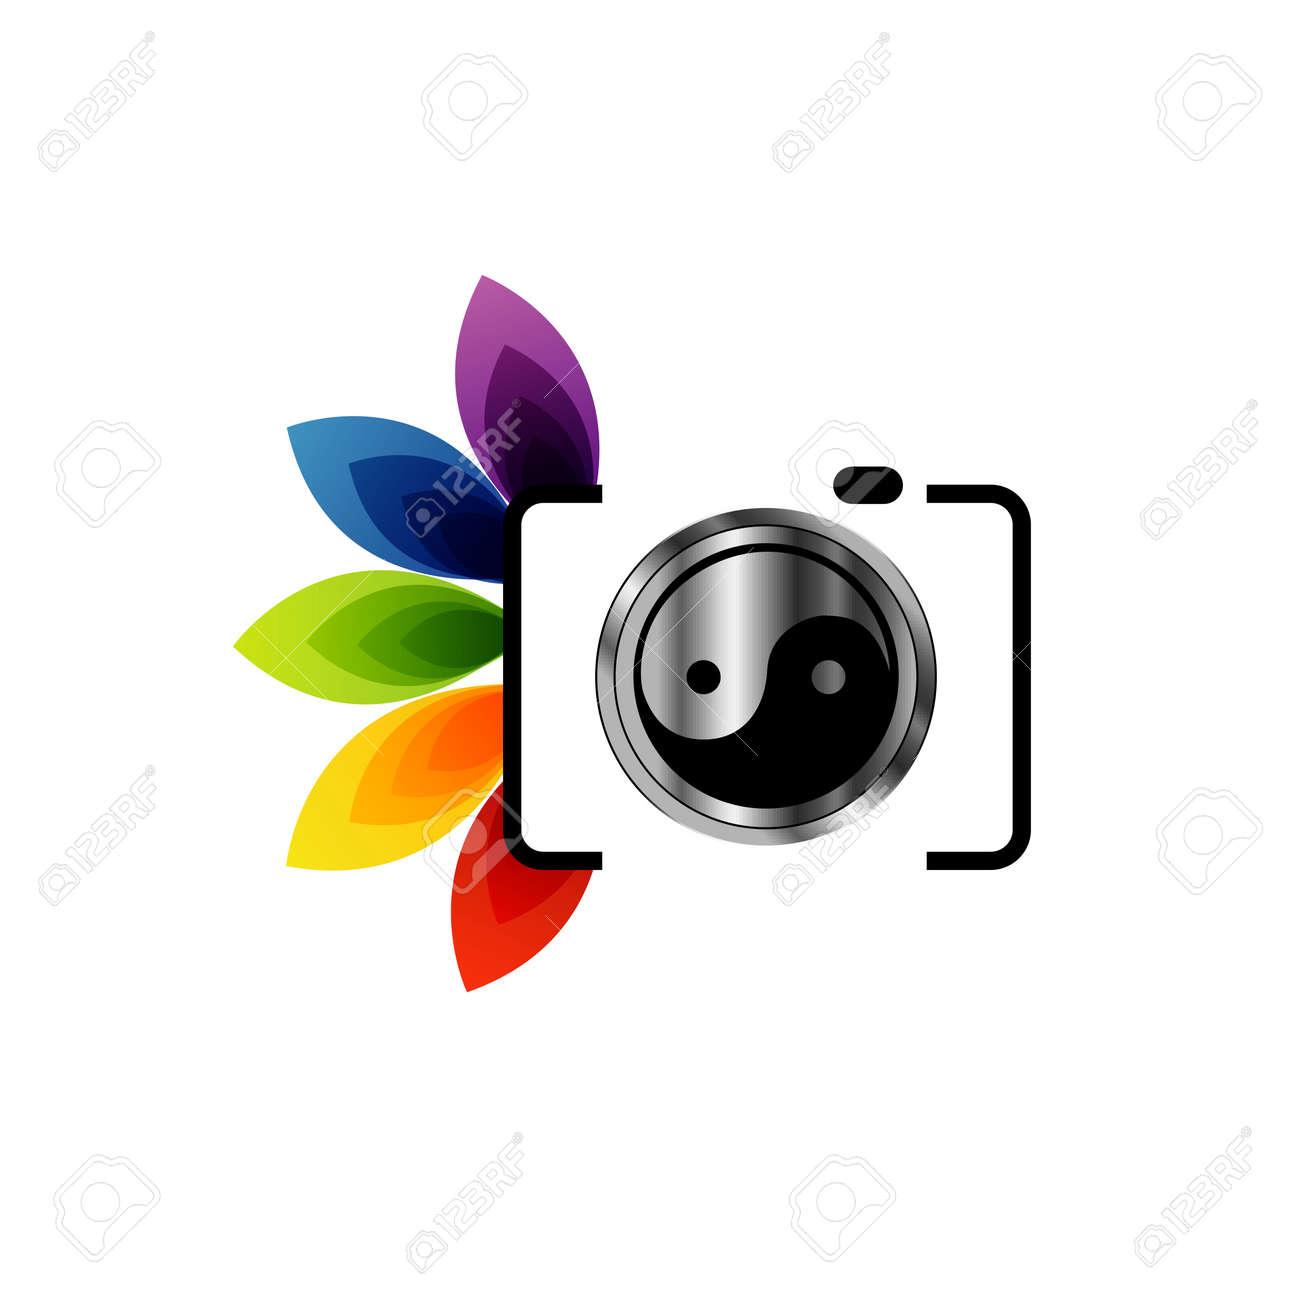 Digital Camera Photography Logo Royalty Free Cliparts Vectors And Stock Illustration Image 24774151